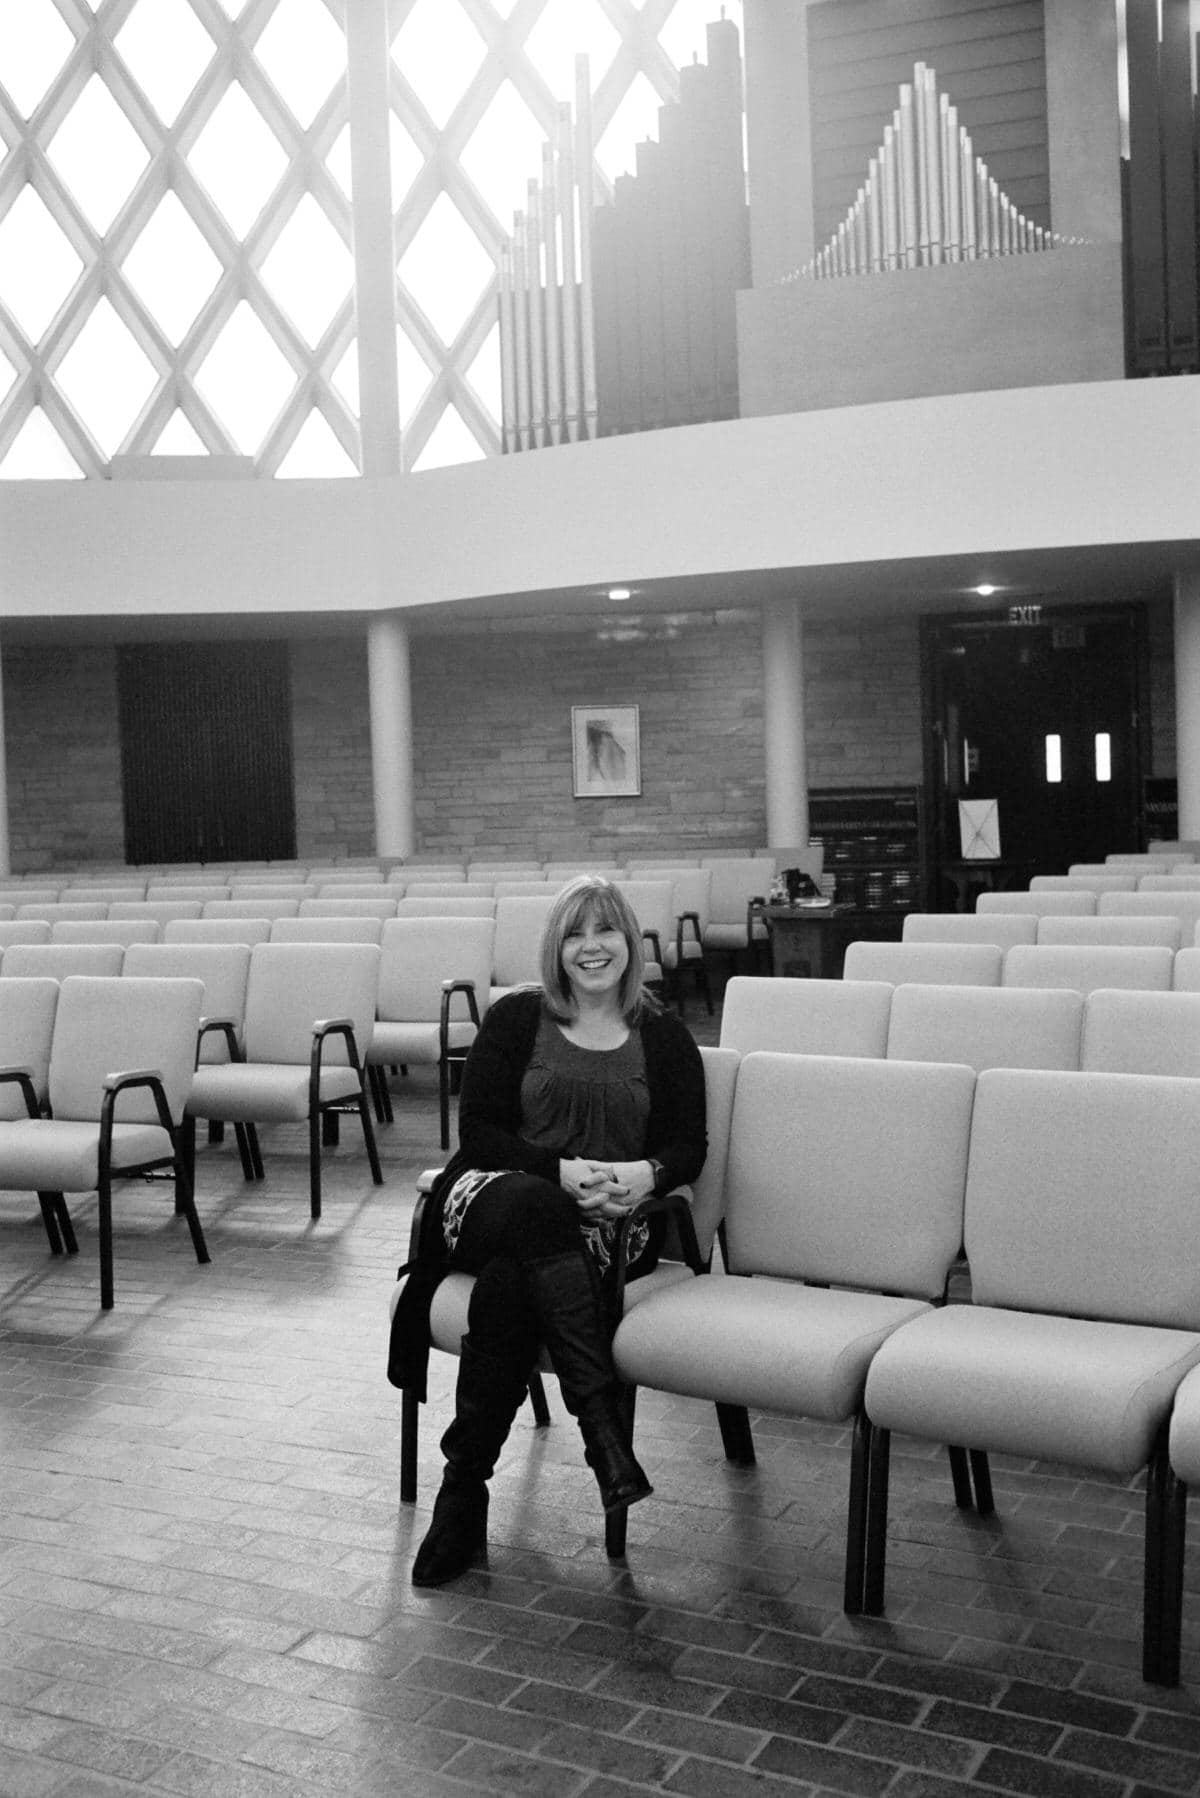 Illuminating-women_exhibition-black-and-white-fine-art-film-photography-of-Leslie-Jaber_Wilson-by-Studio-L-photographer-Laura-Schneider-_001